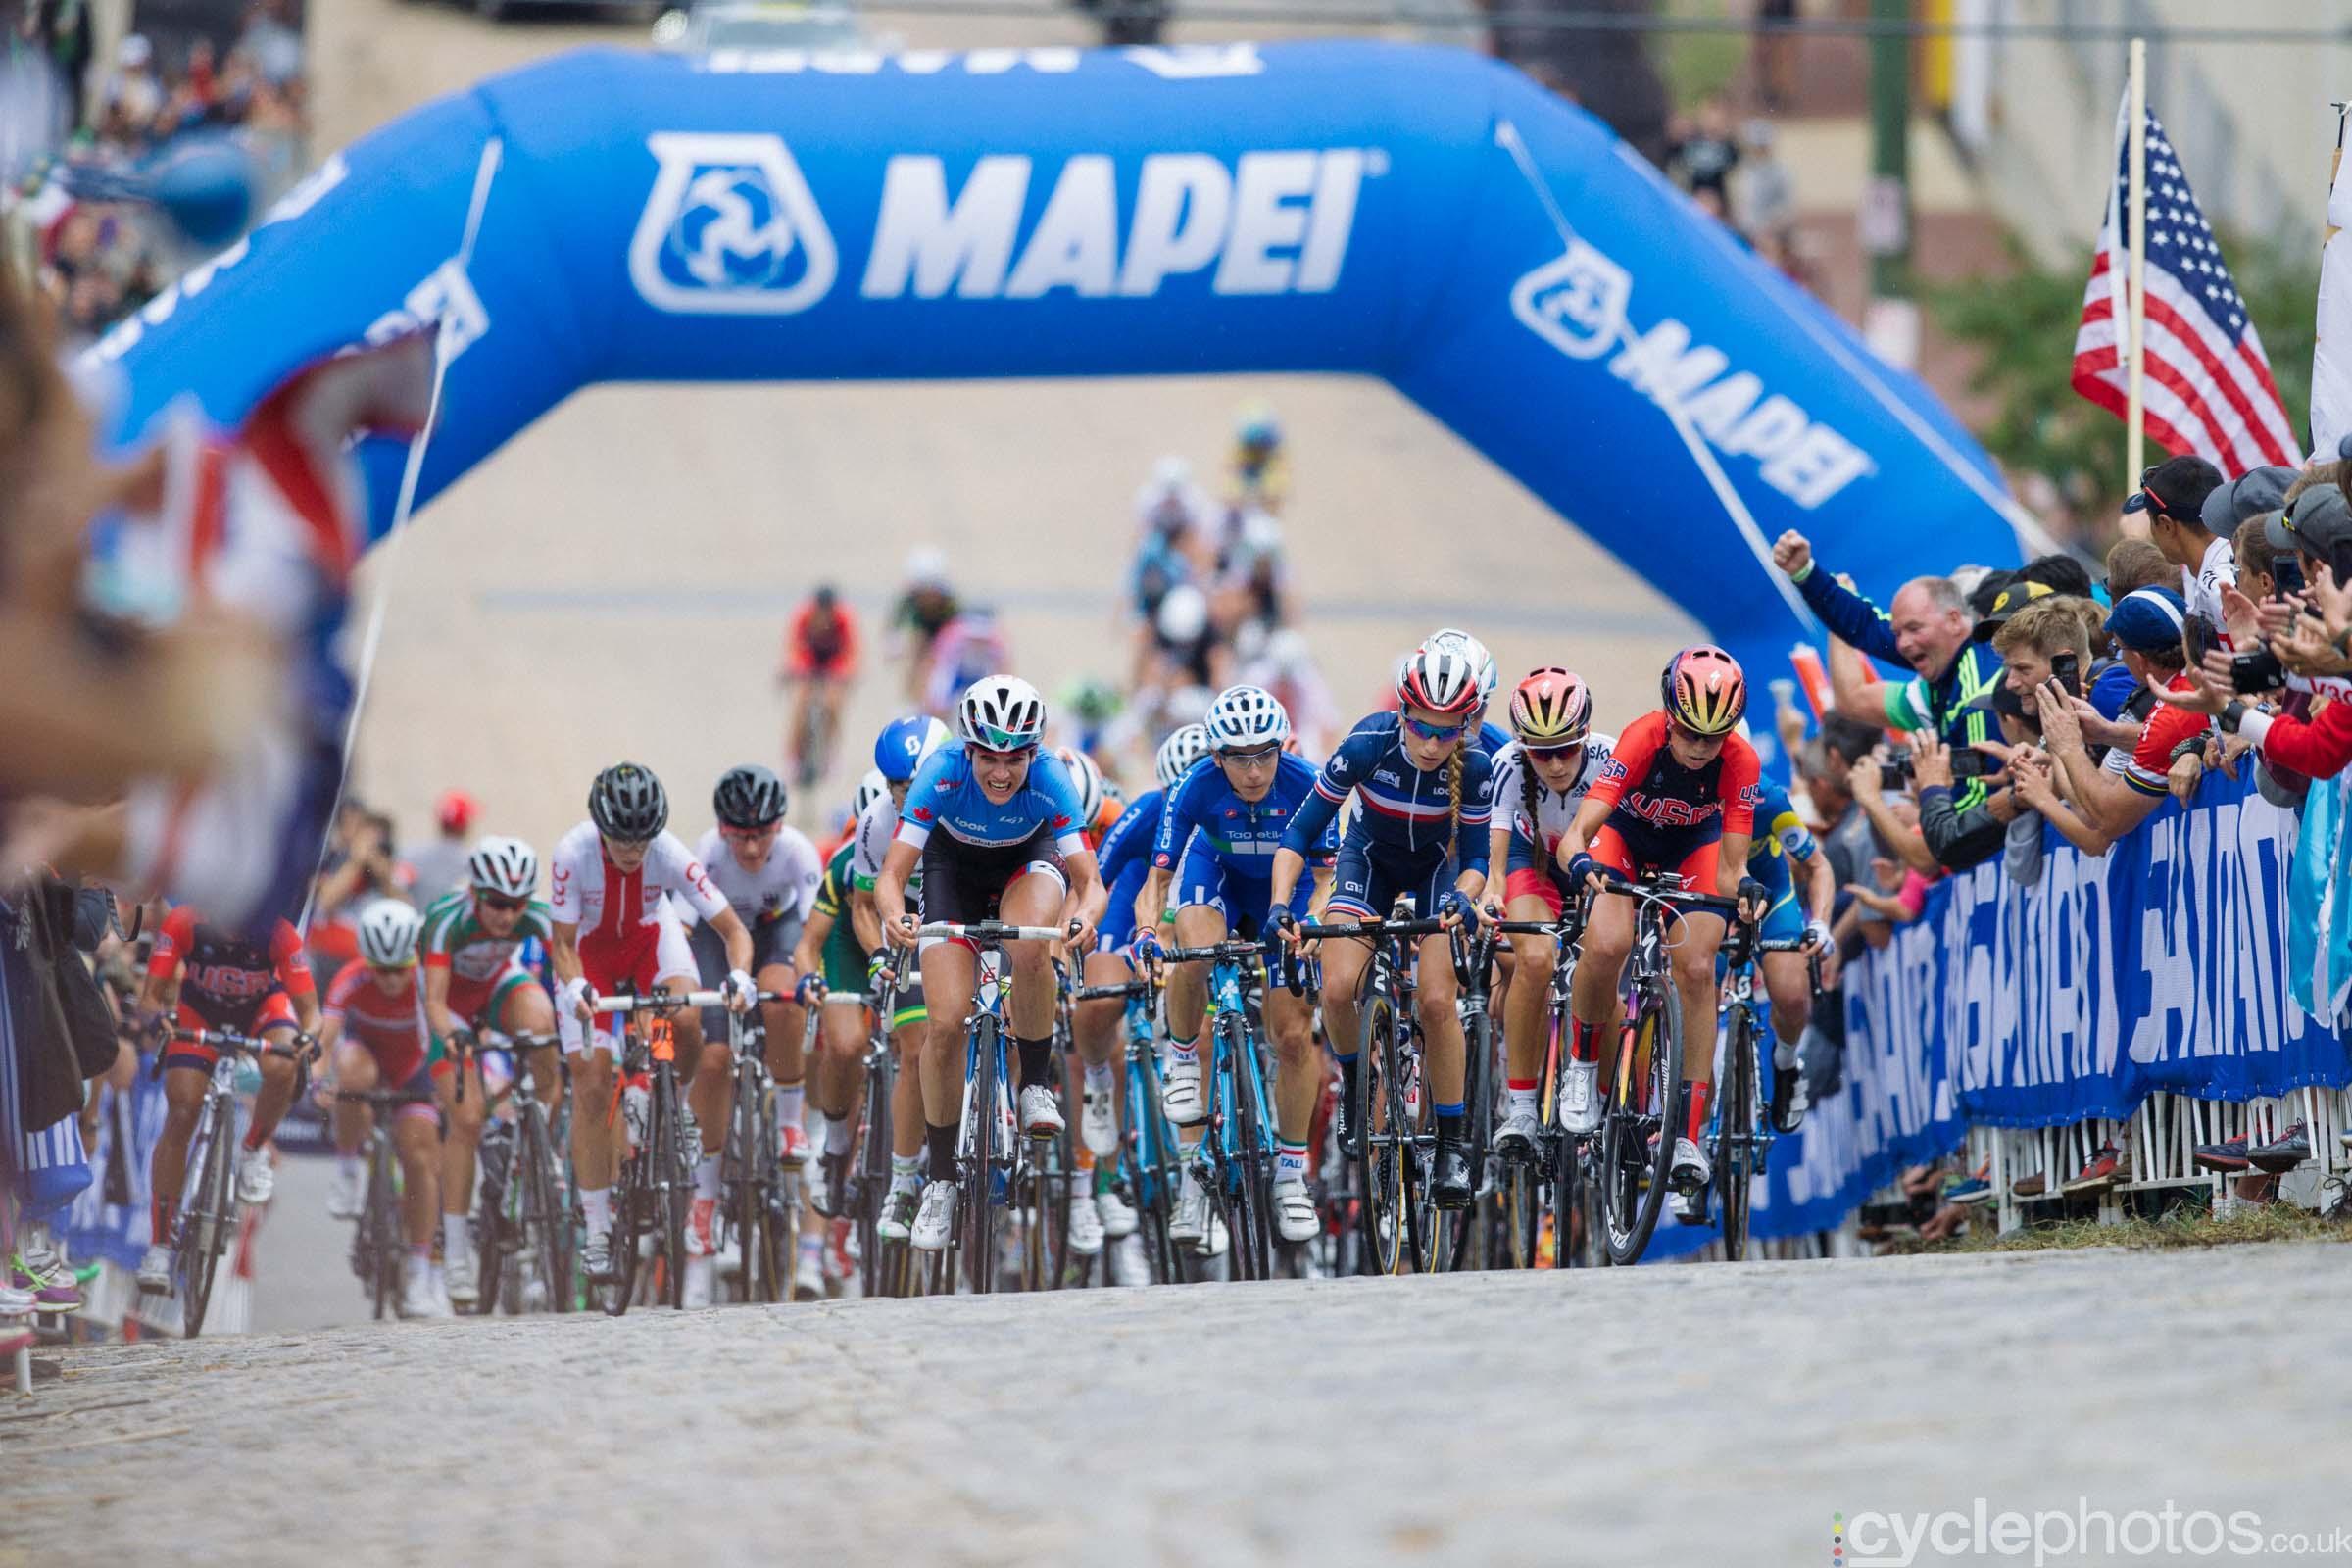 cyclephotos-world-champs-richmond-150129